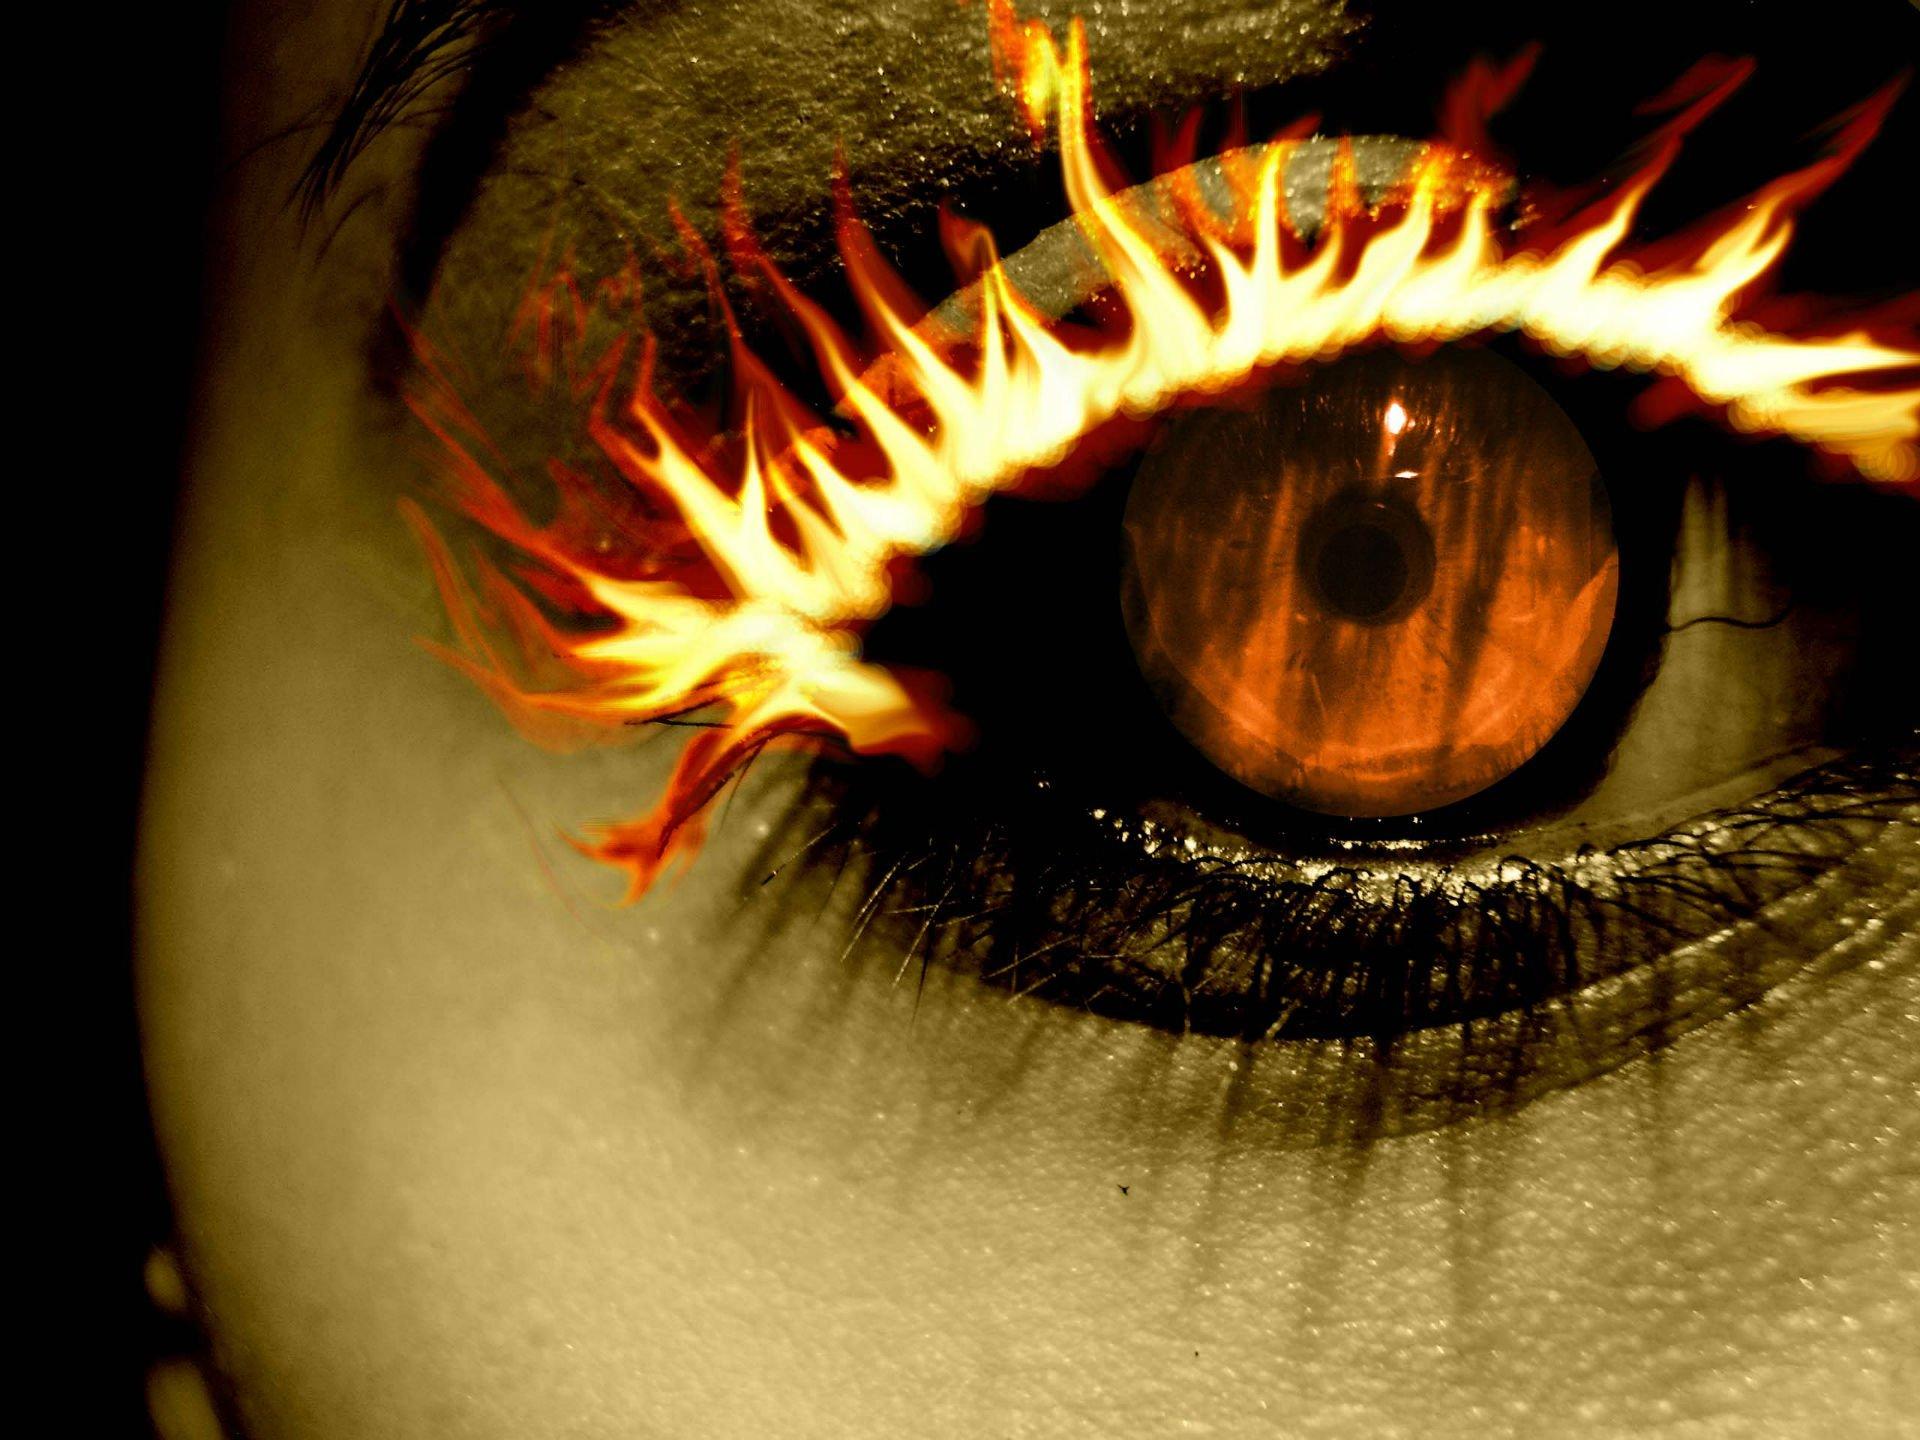 eyes face evil satan wallpaper 1920x1440 32282 WallpaperUP 1920x1440